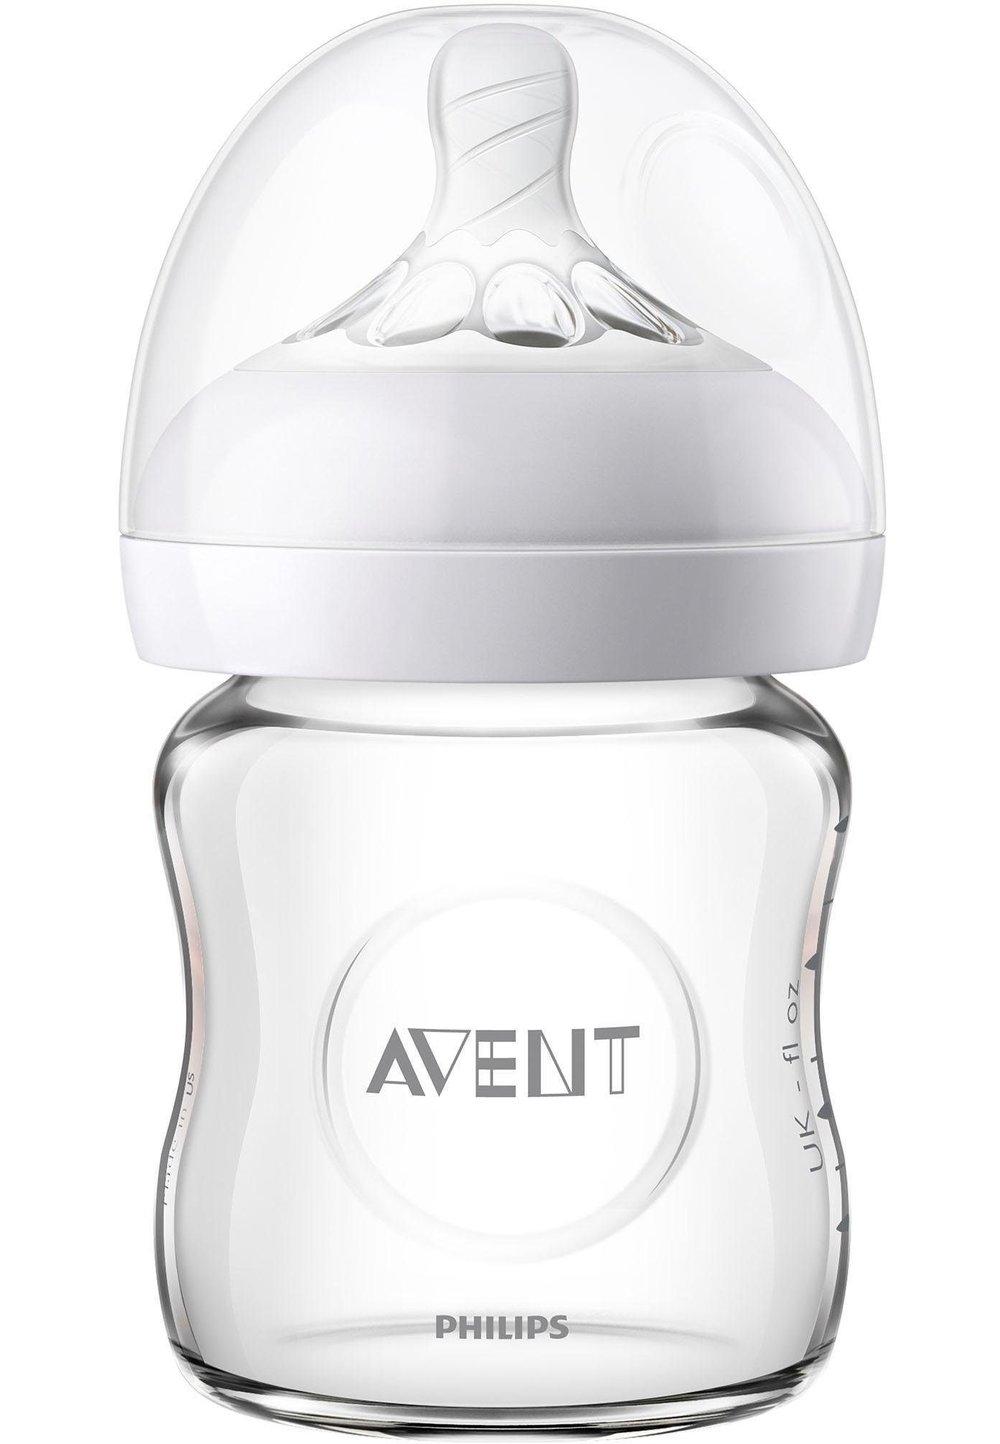 Biberon sticla, Philips Avent, + 0 luni, 120 ml imagine